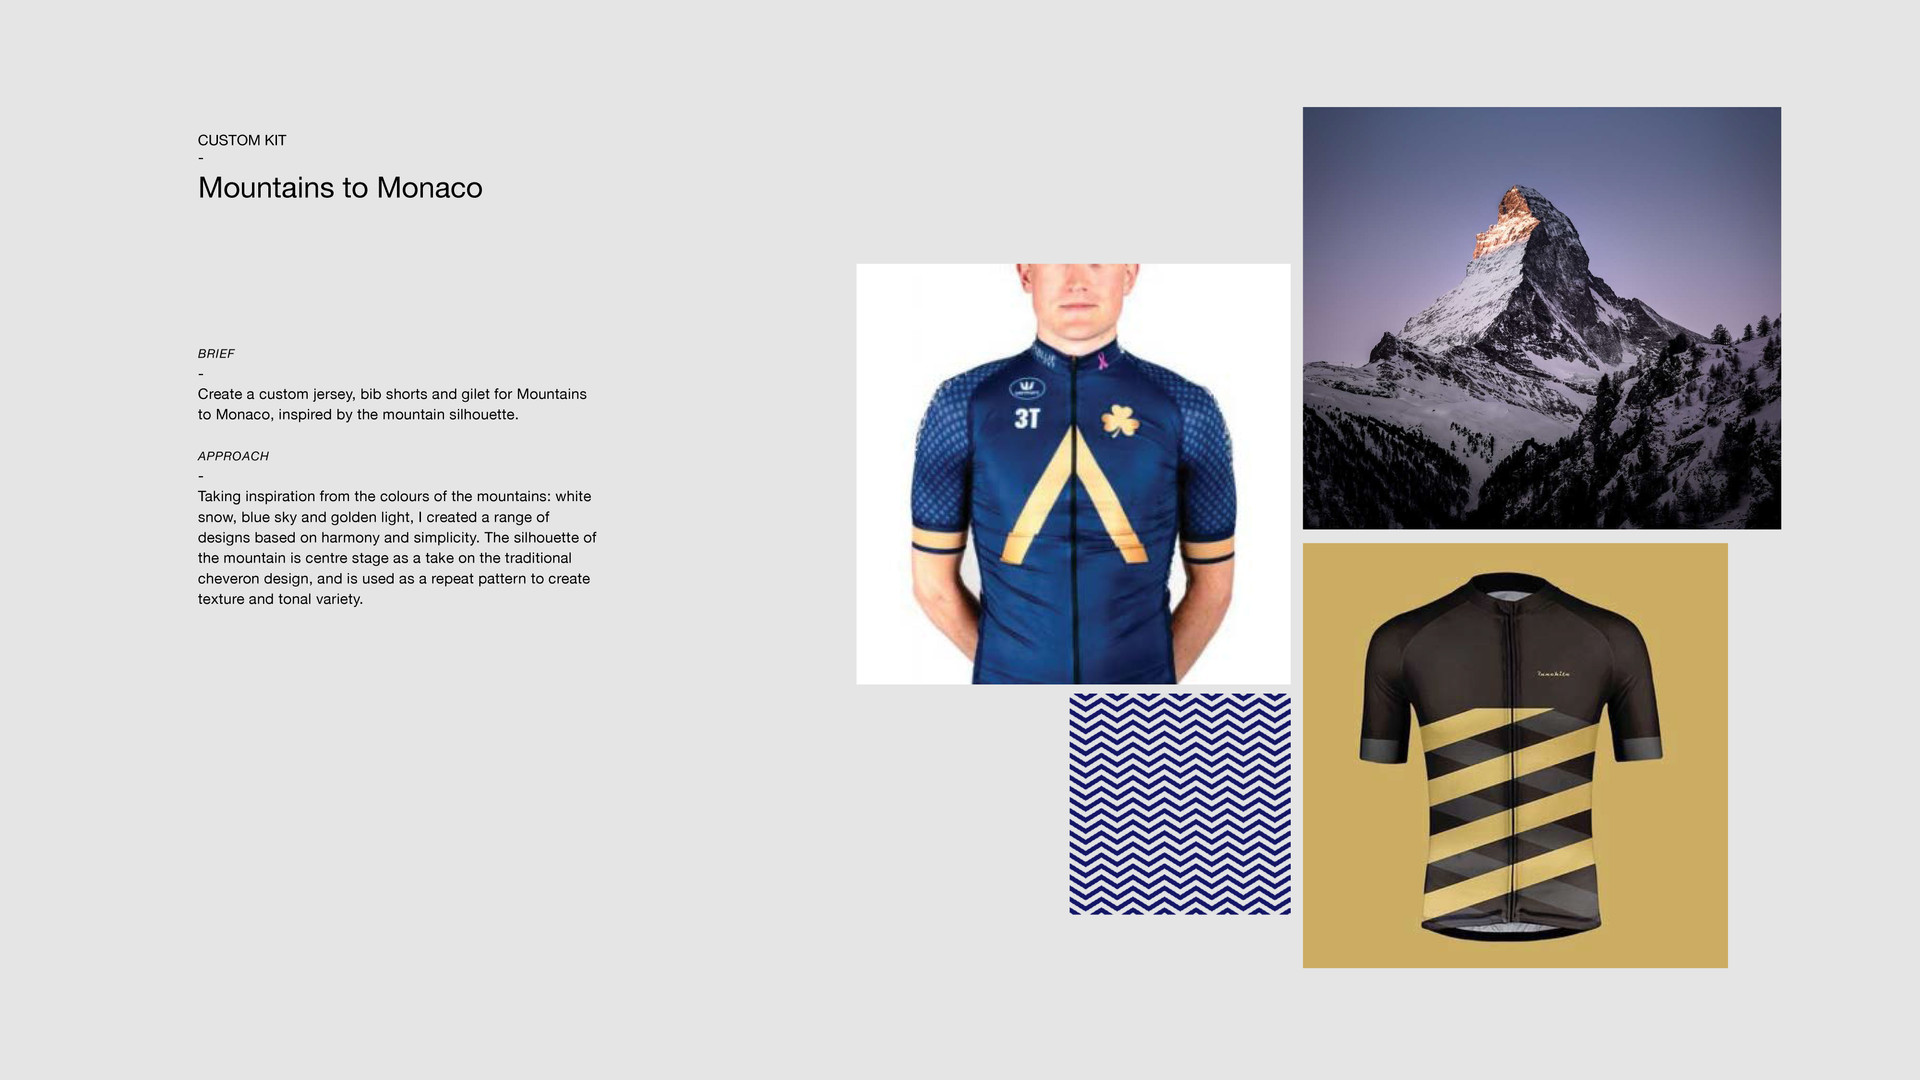 Tom_Probert_Custom_Kits_Page_11.jpg